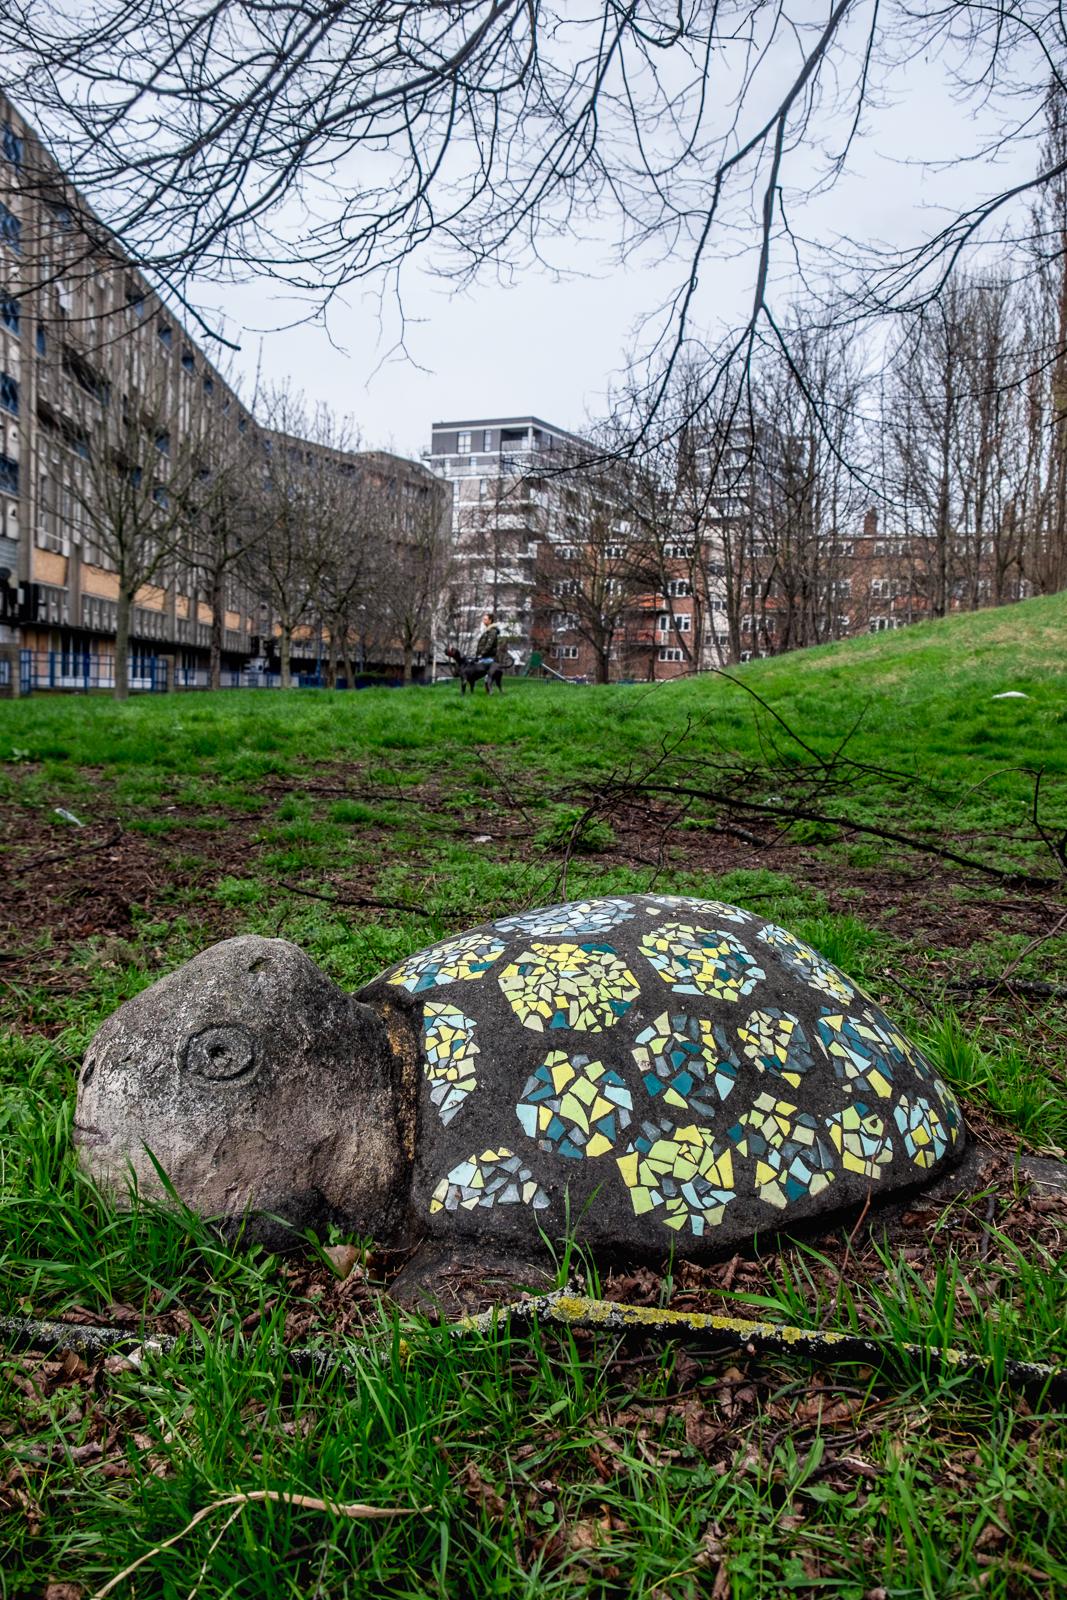 20170311_Tower-Hamlets_Robin-Hood-Gardens_Stone-Me-Its-a-Turtle